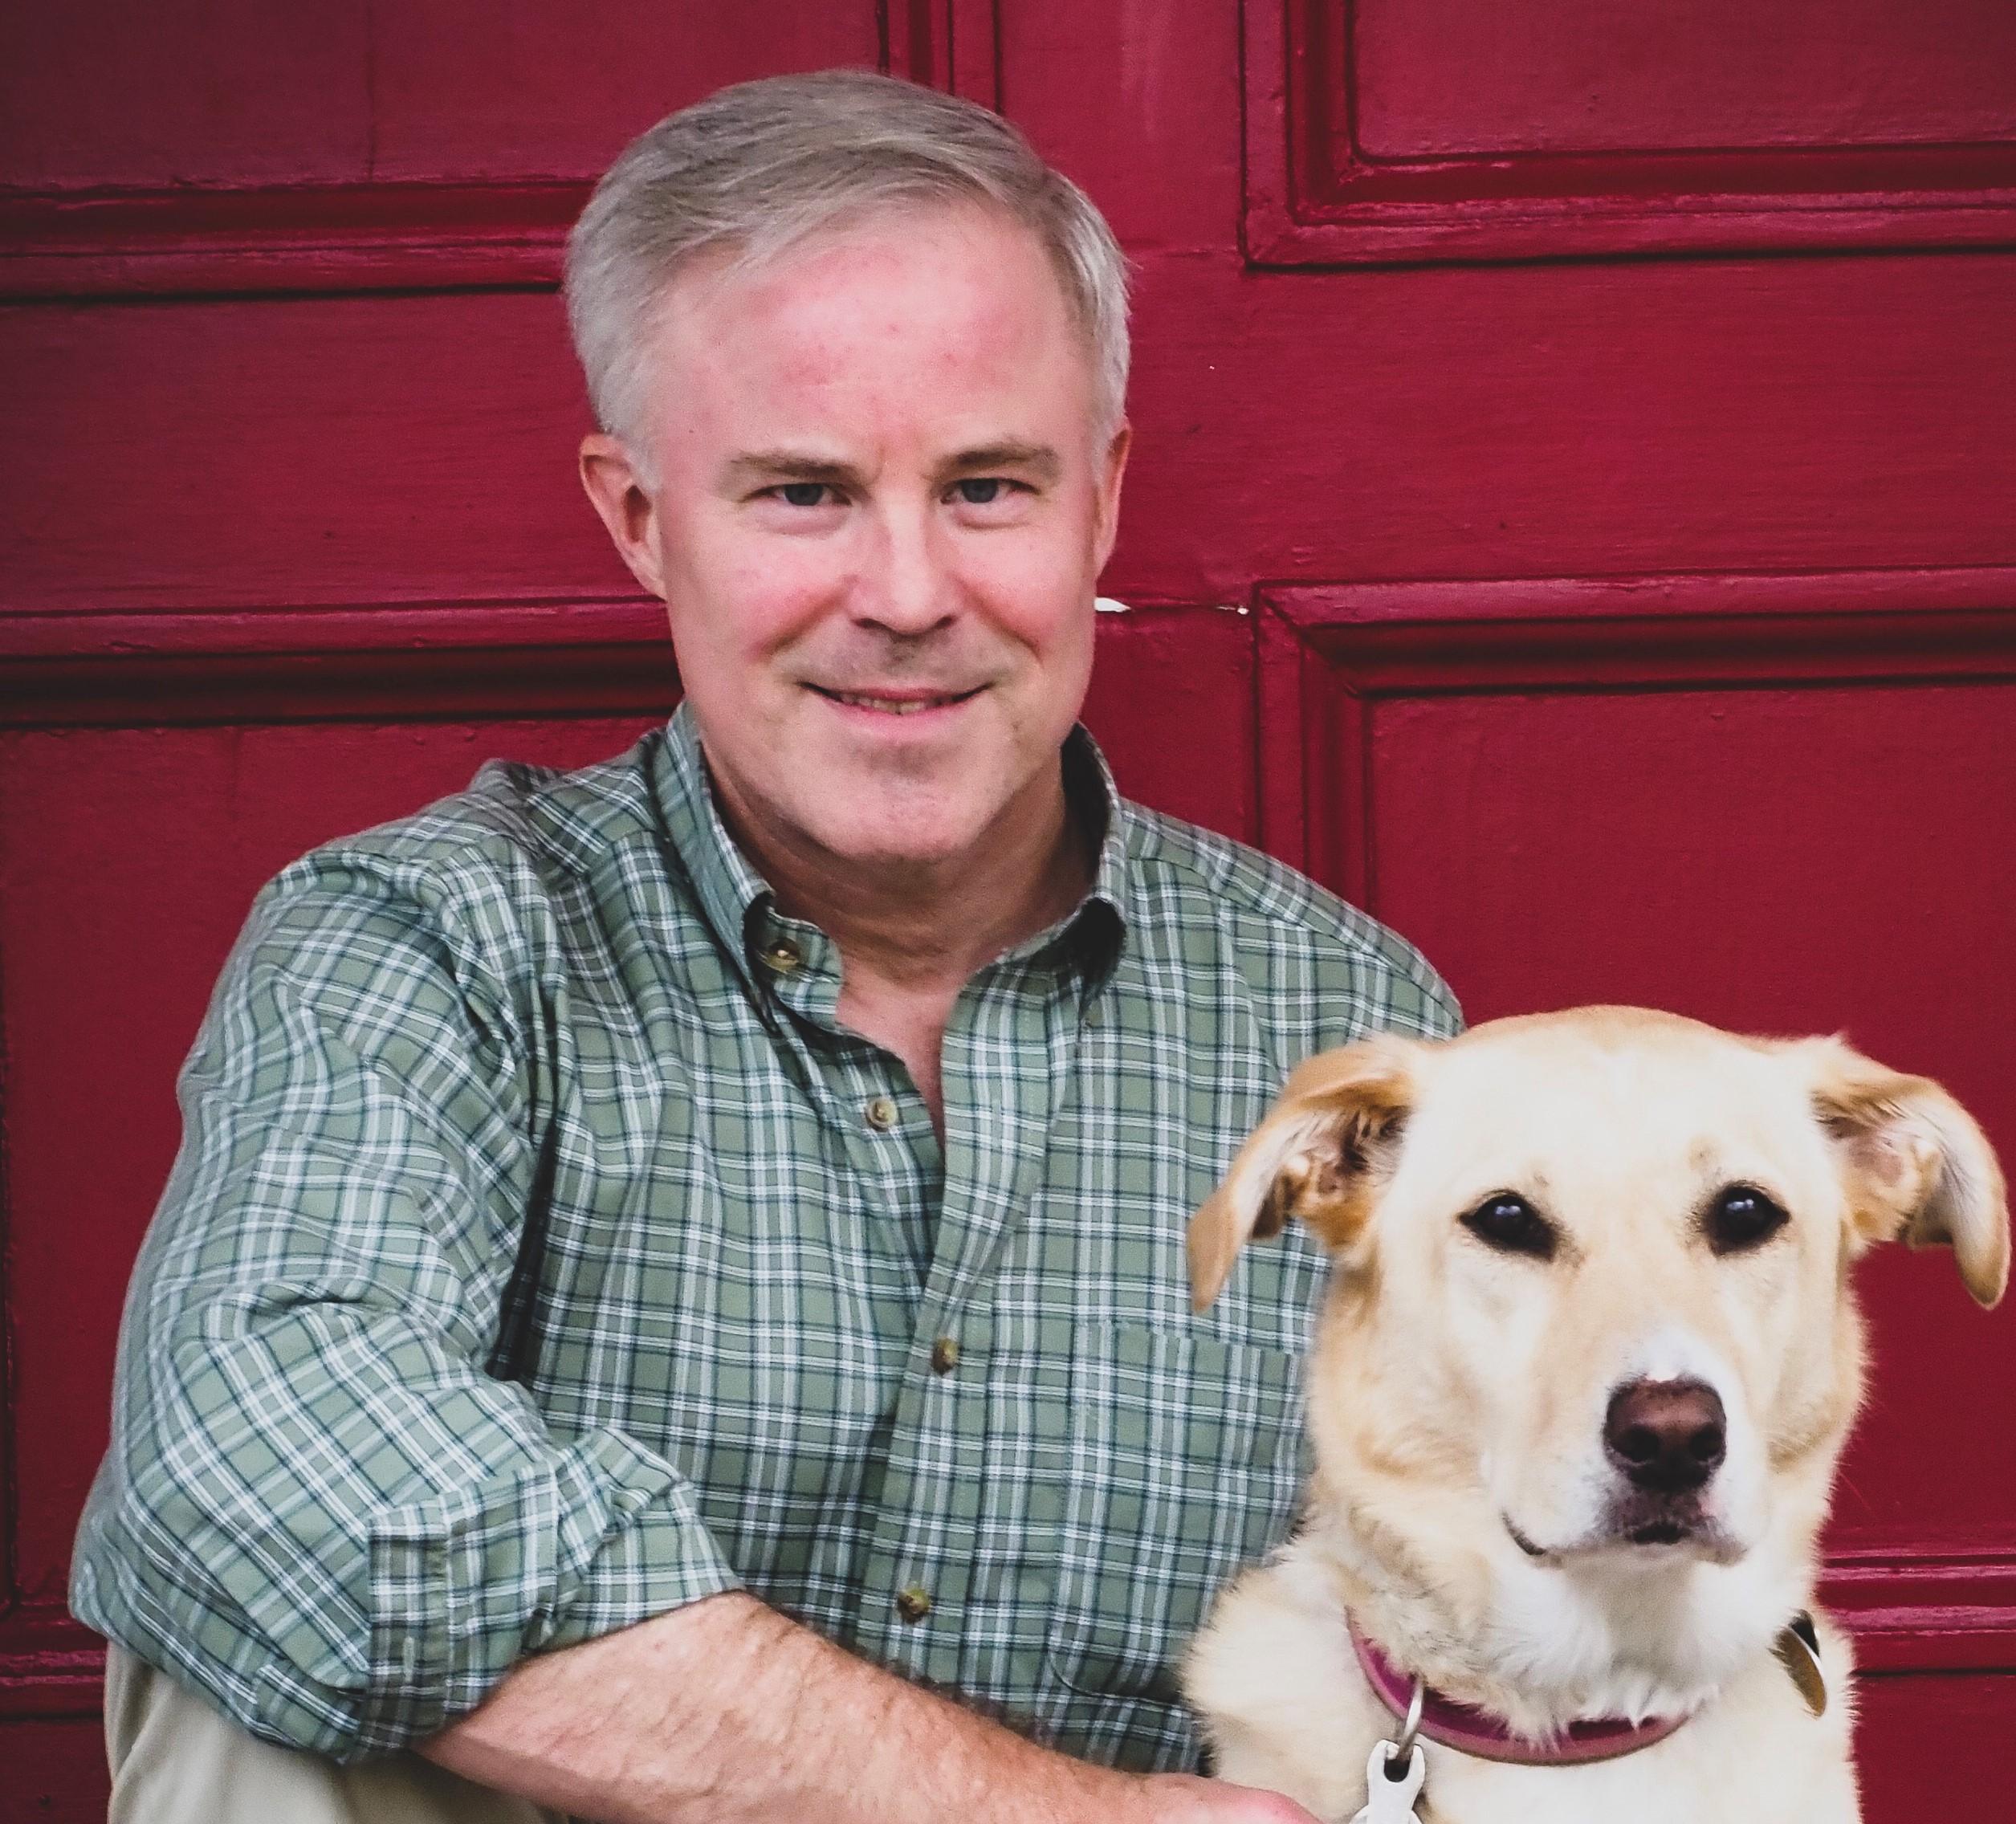 cressman with dog headshot (2)